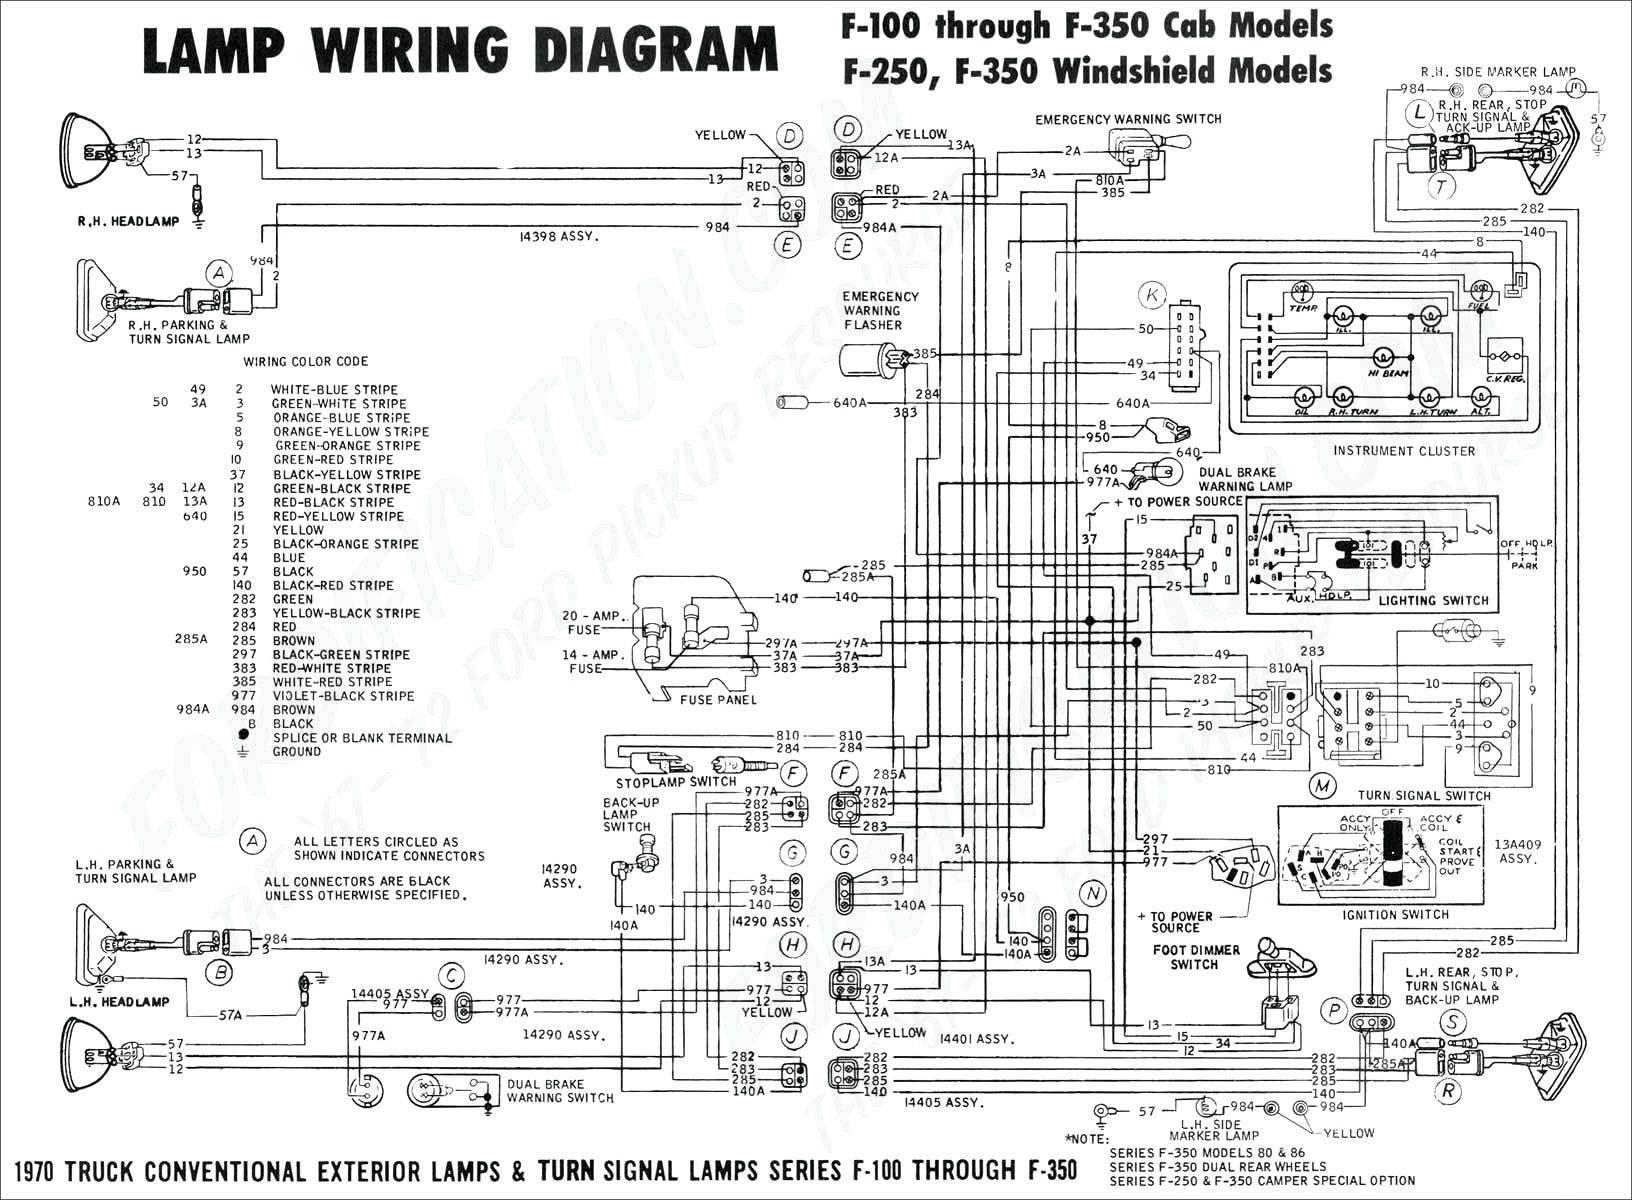 Front End Suspension Parts Diagram Wiring Diagram 2000 Chevy S10 Rear End Wiring Diagram Load Of Front End Suspension Parts Diagram